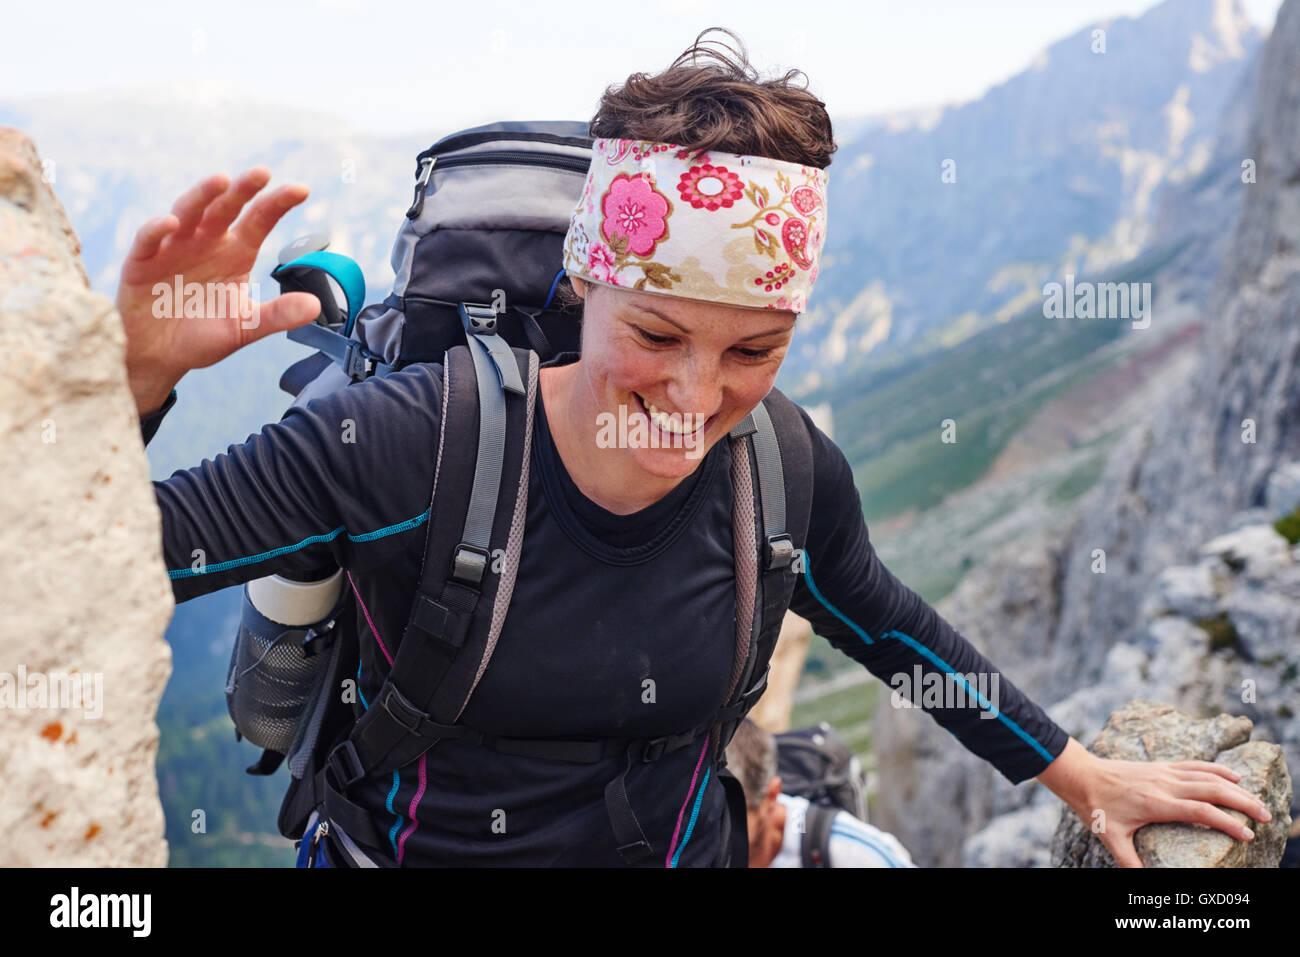 Frau, Lächeln, Österreich Berg hinauf wandern Stockbild